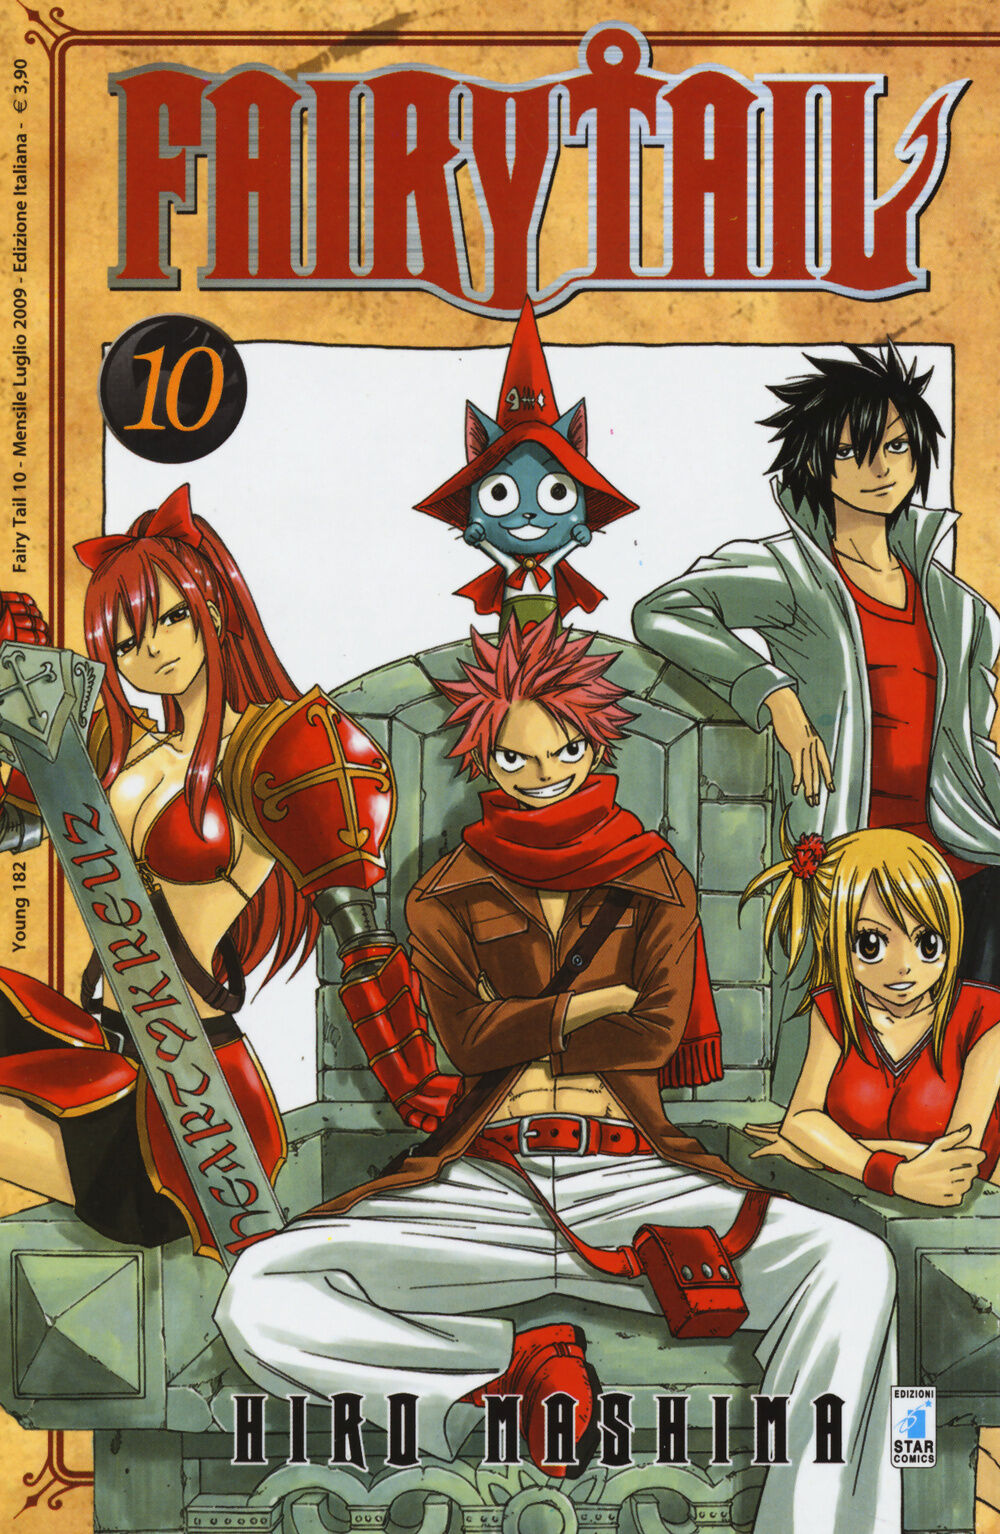 Fairy Tail. Vol. 10